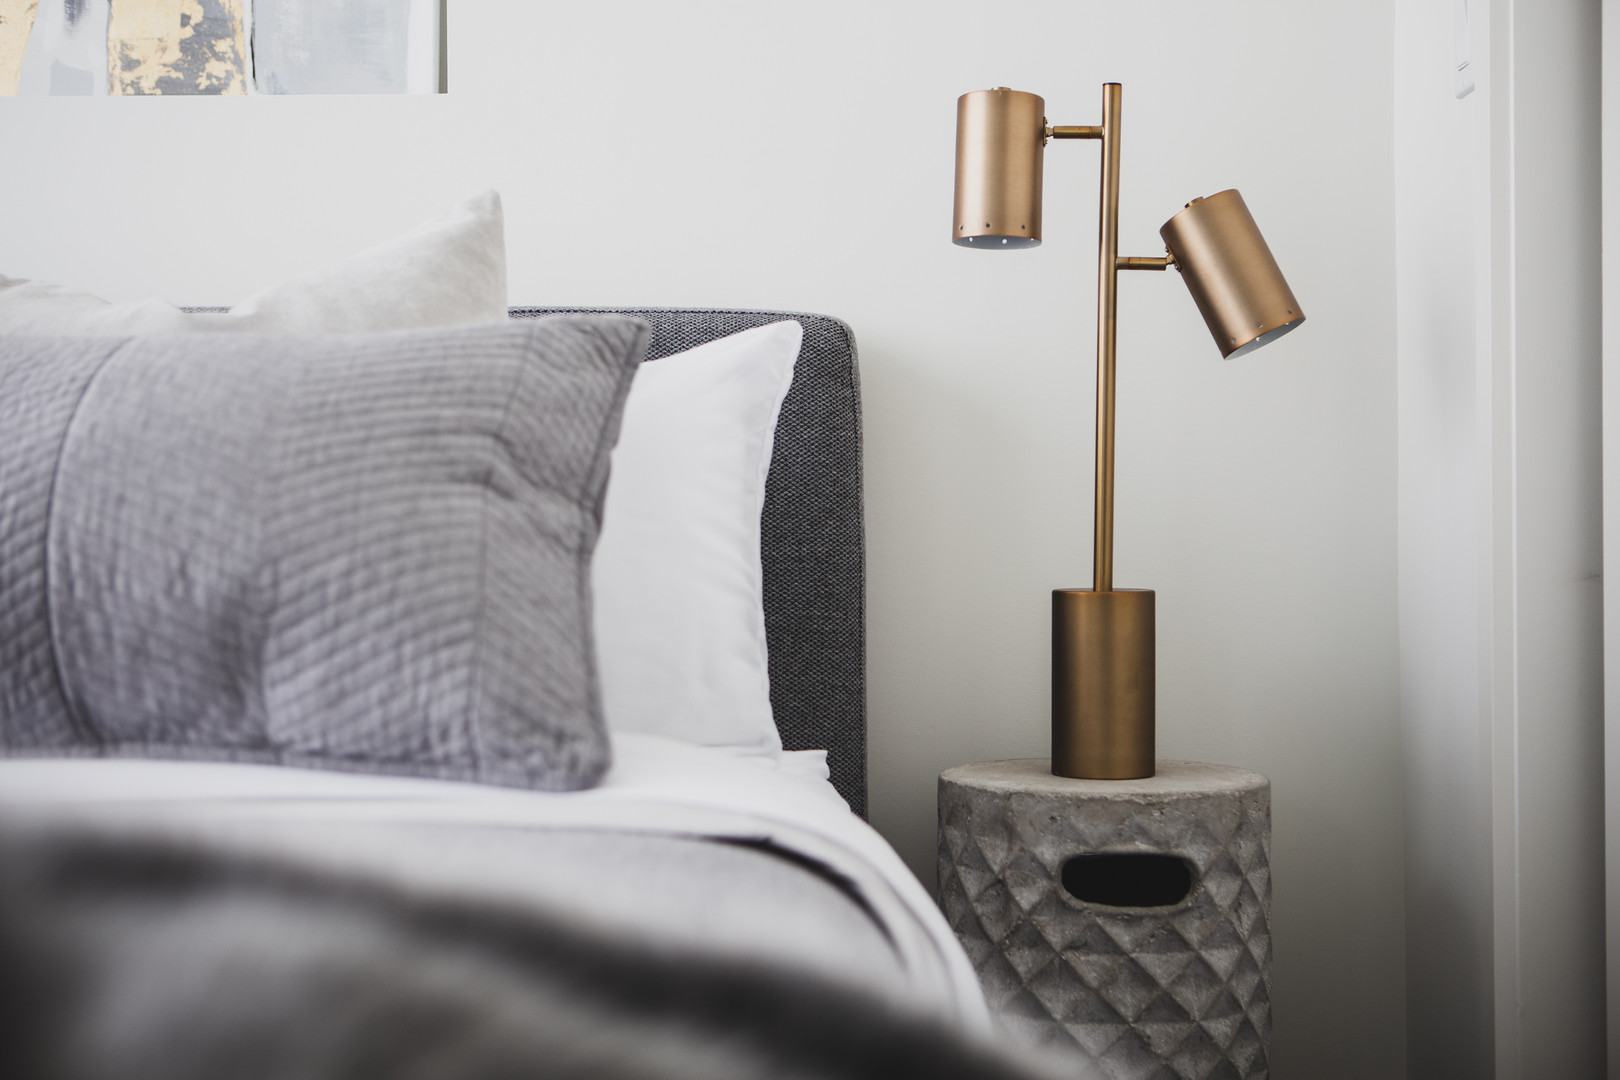 Bedroom 2 Bedside Table & Lamp